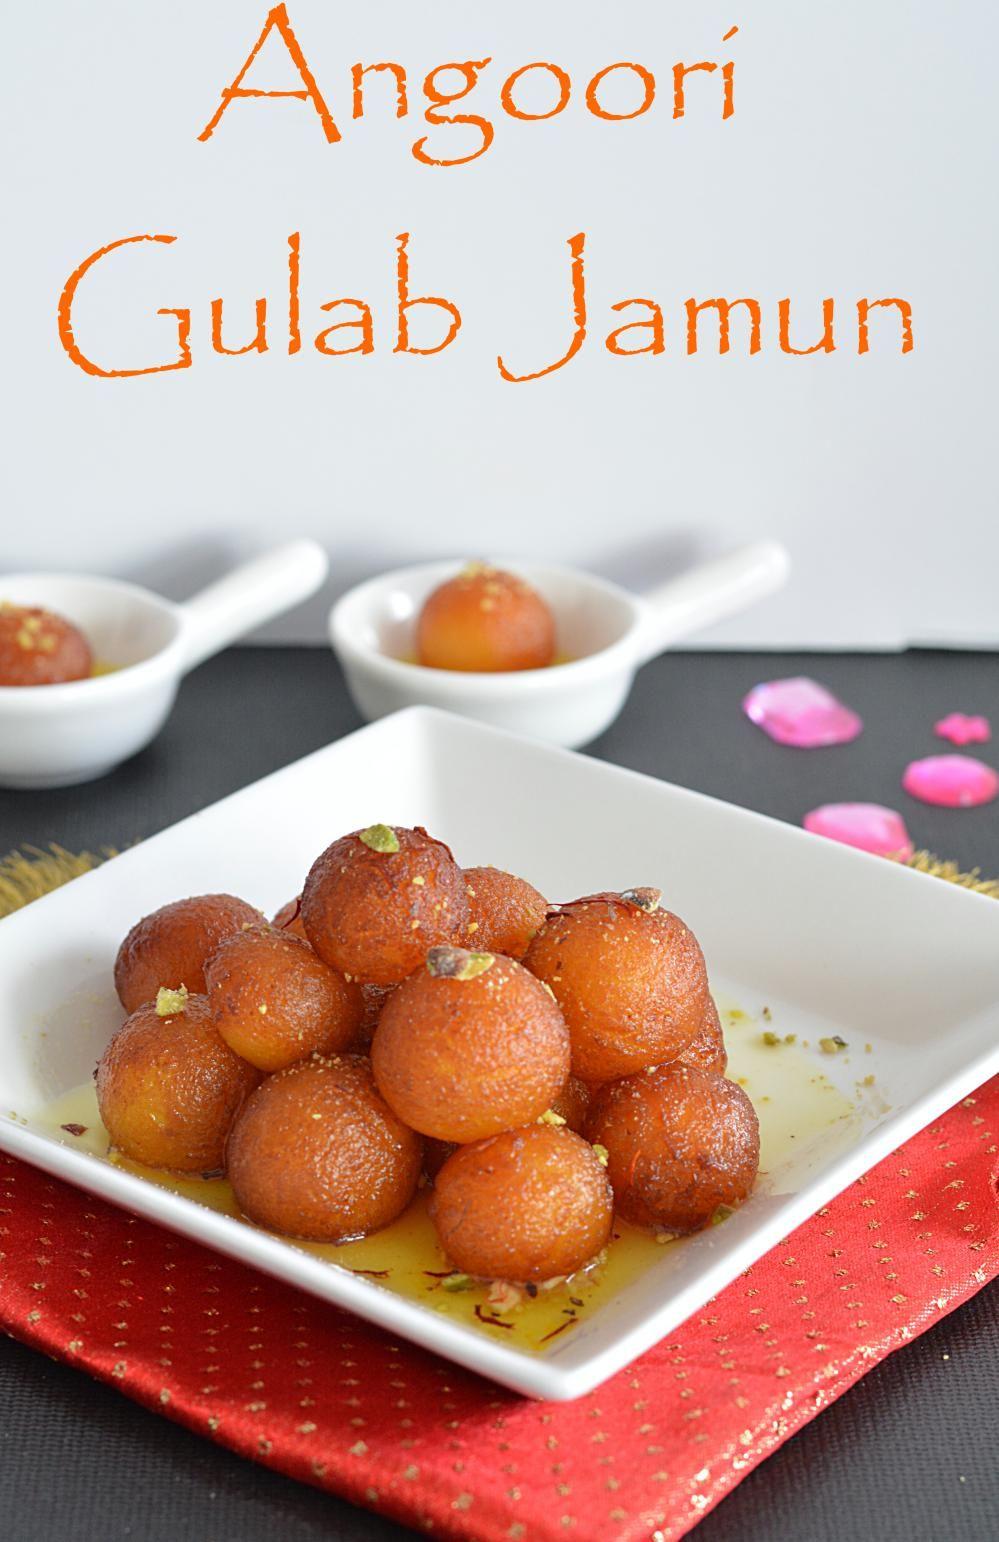 Angoori gulab jamun sweets pinterest gulab jamun indian angoori gulab jamun easy indian recipesindian dessert forumfinder Gallery